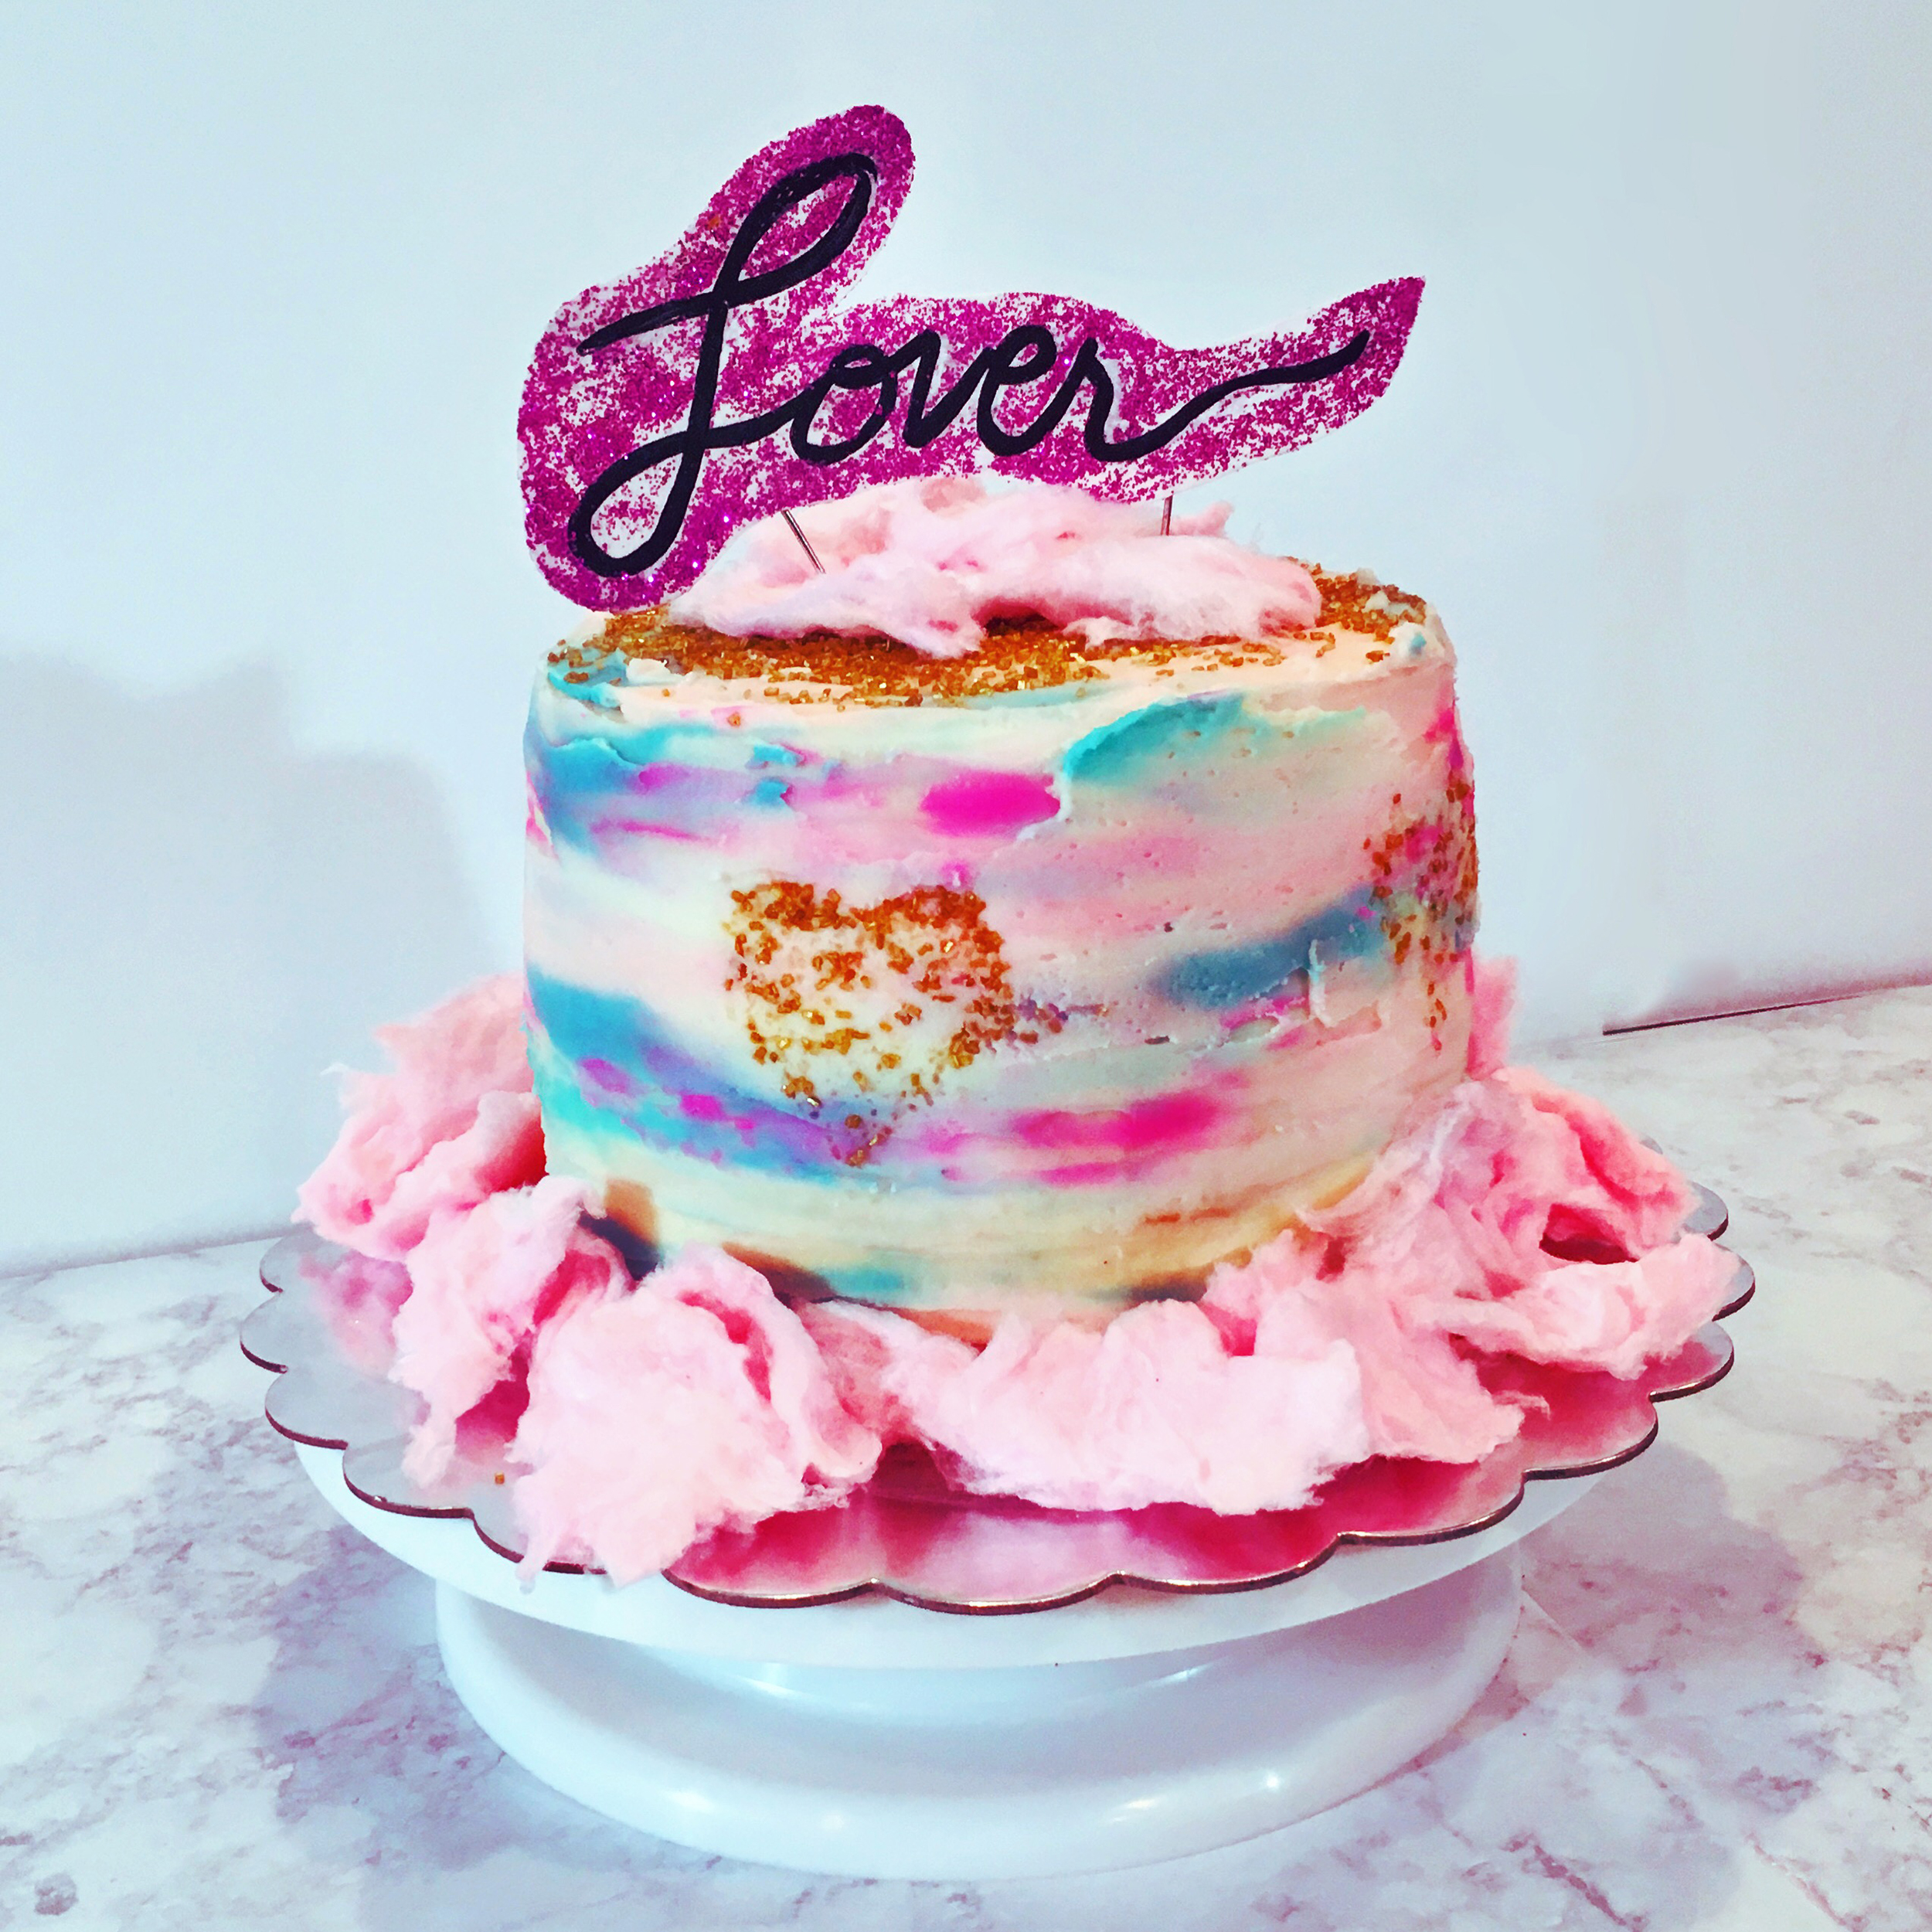 Cool Taylor Swift Lover Confetti Cake The Sweet Spot Funny Birthday Cards Online Elaedamsfinfo